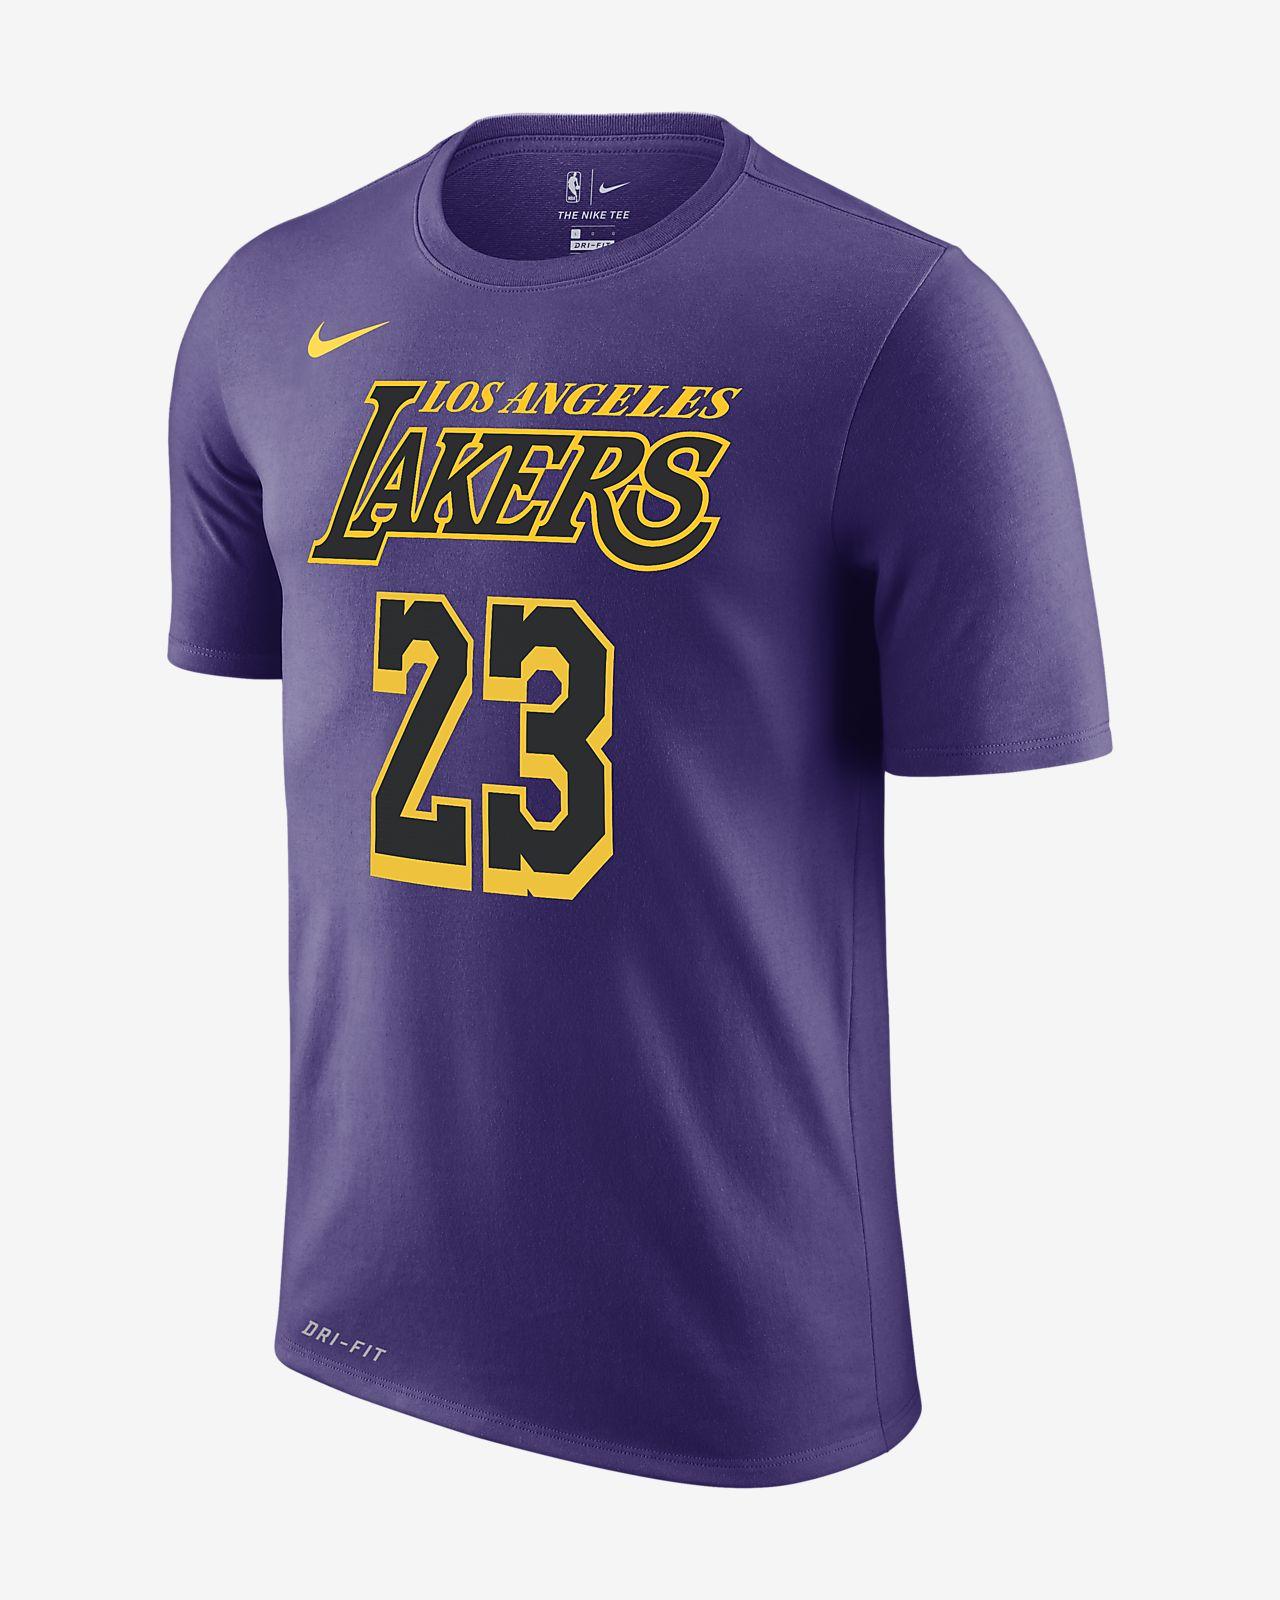 洛杉矶湖人队 City Edition Nike Dri-FIT 男子 NBA T恤